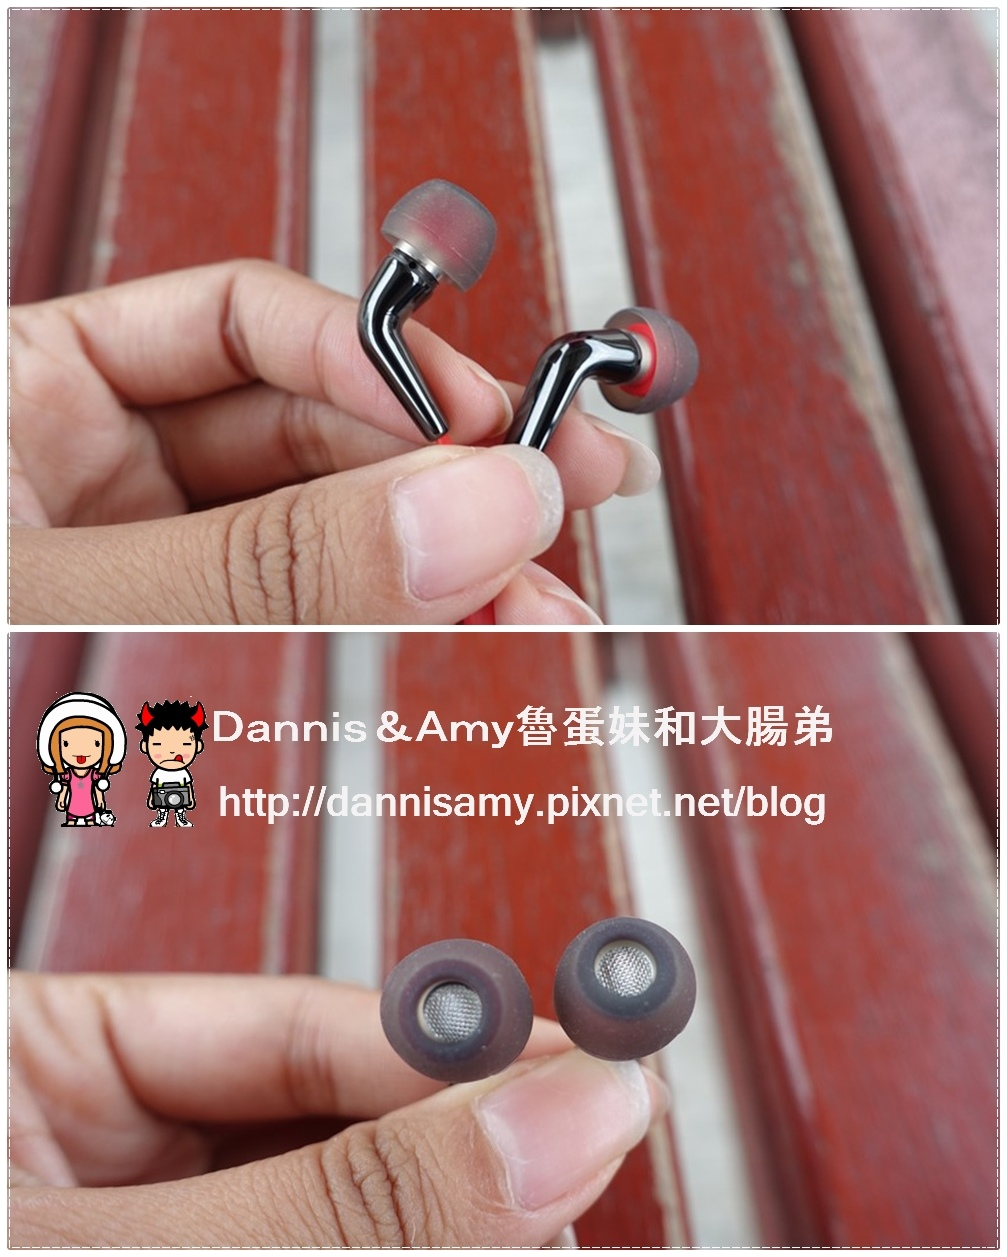 BONNAIRE】 MX-220i 奈米陶瓷入耳式iPhone线控耳机 (4).jpg